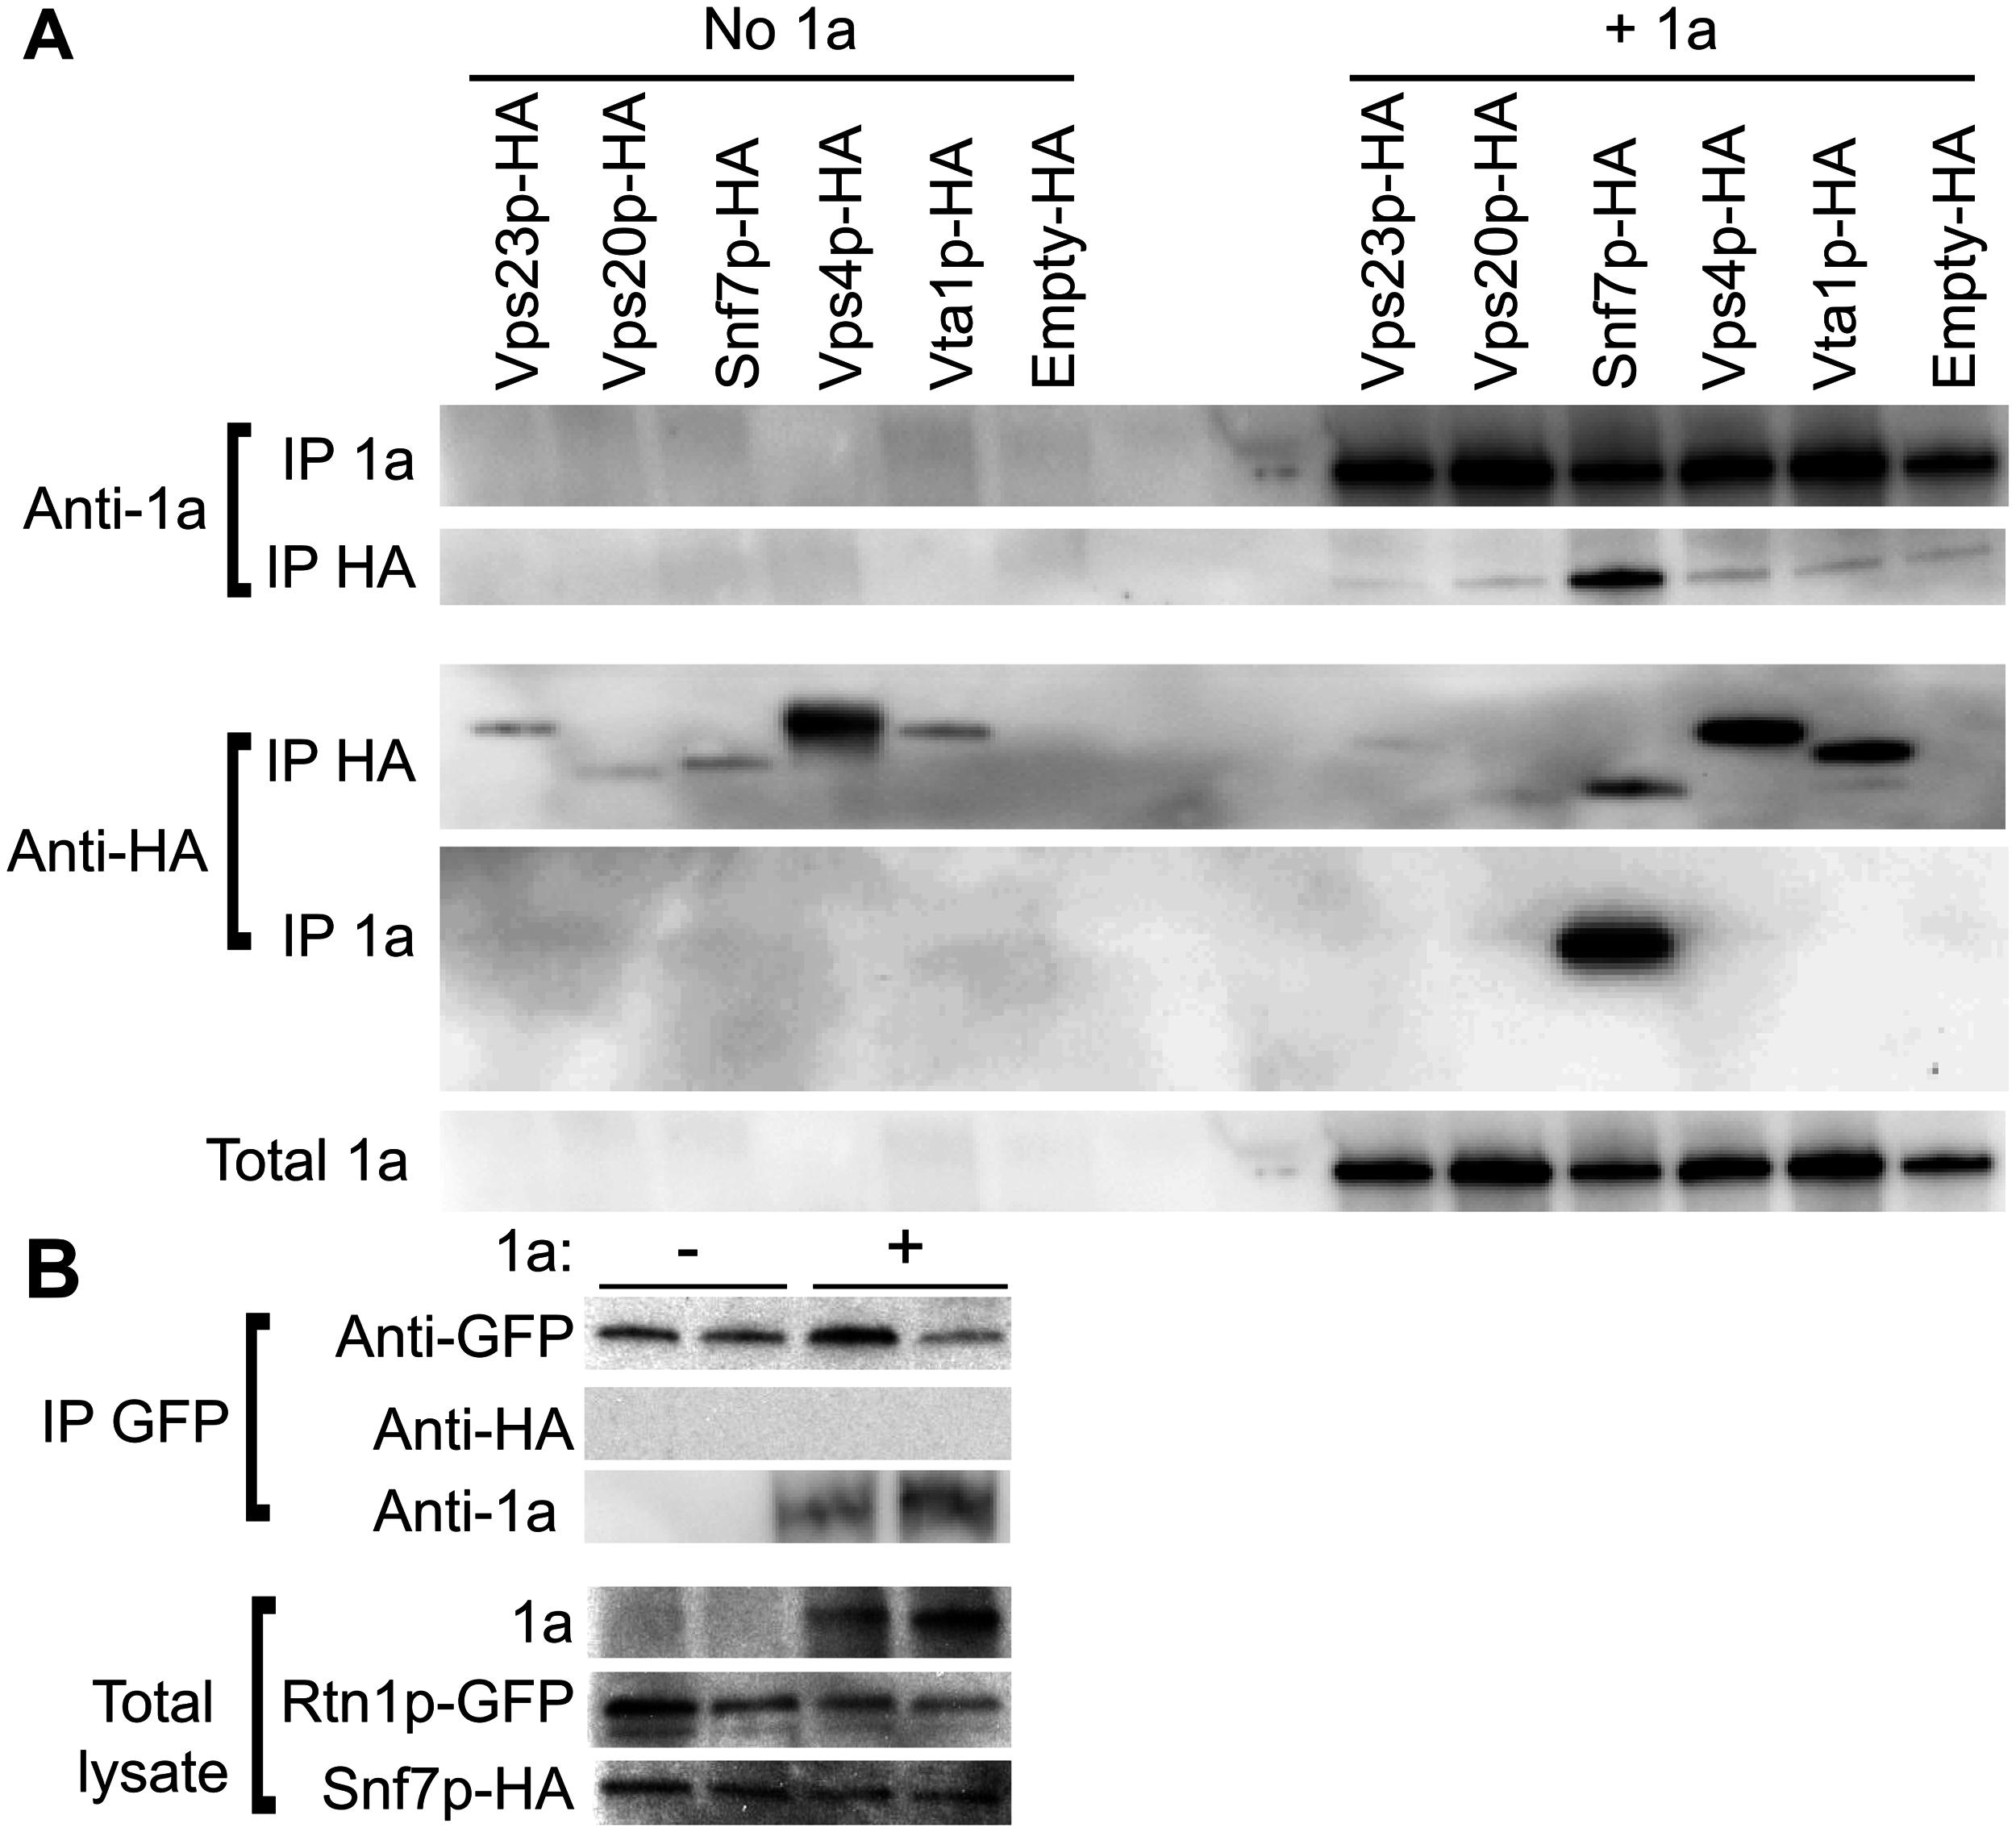 Snf7p immunoprecipitates with BMV 1a but not with Rtn1p.